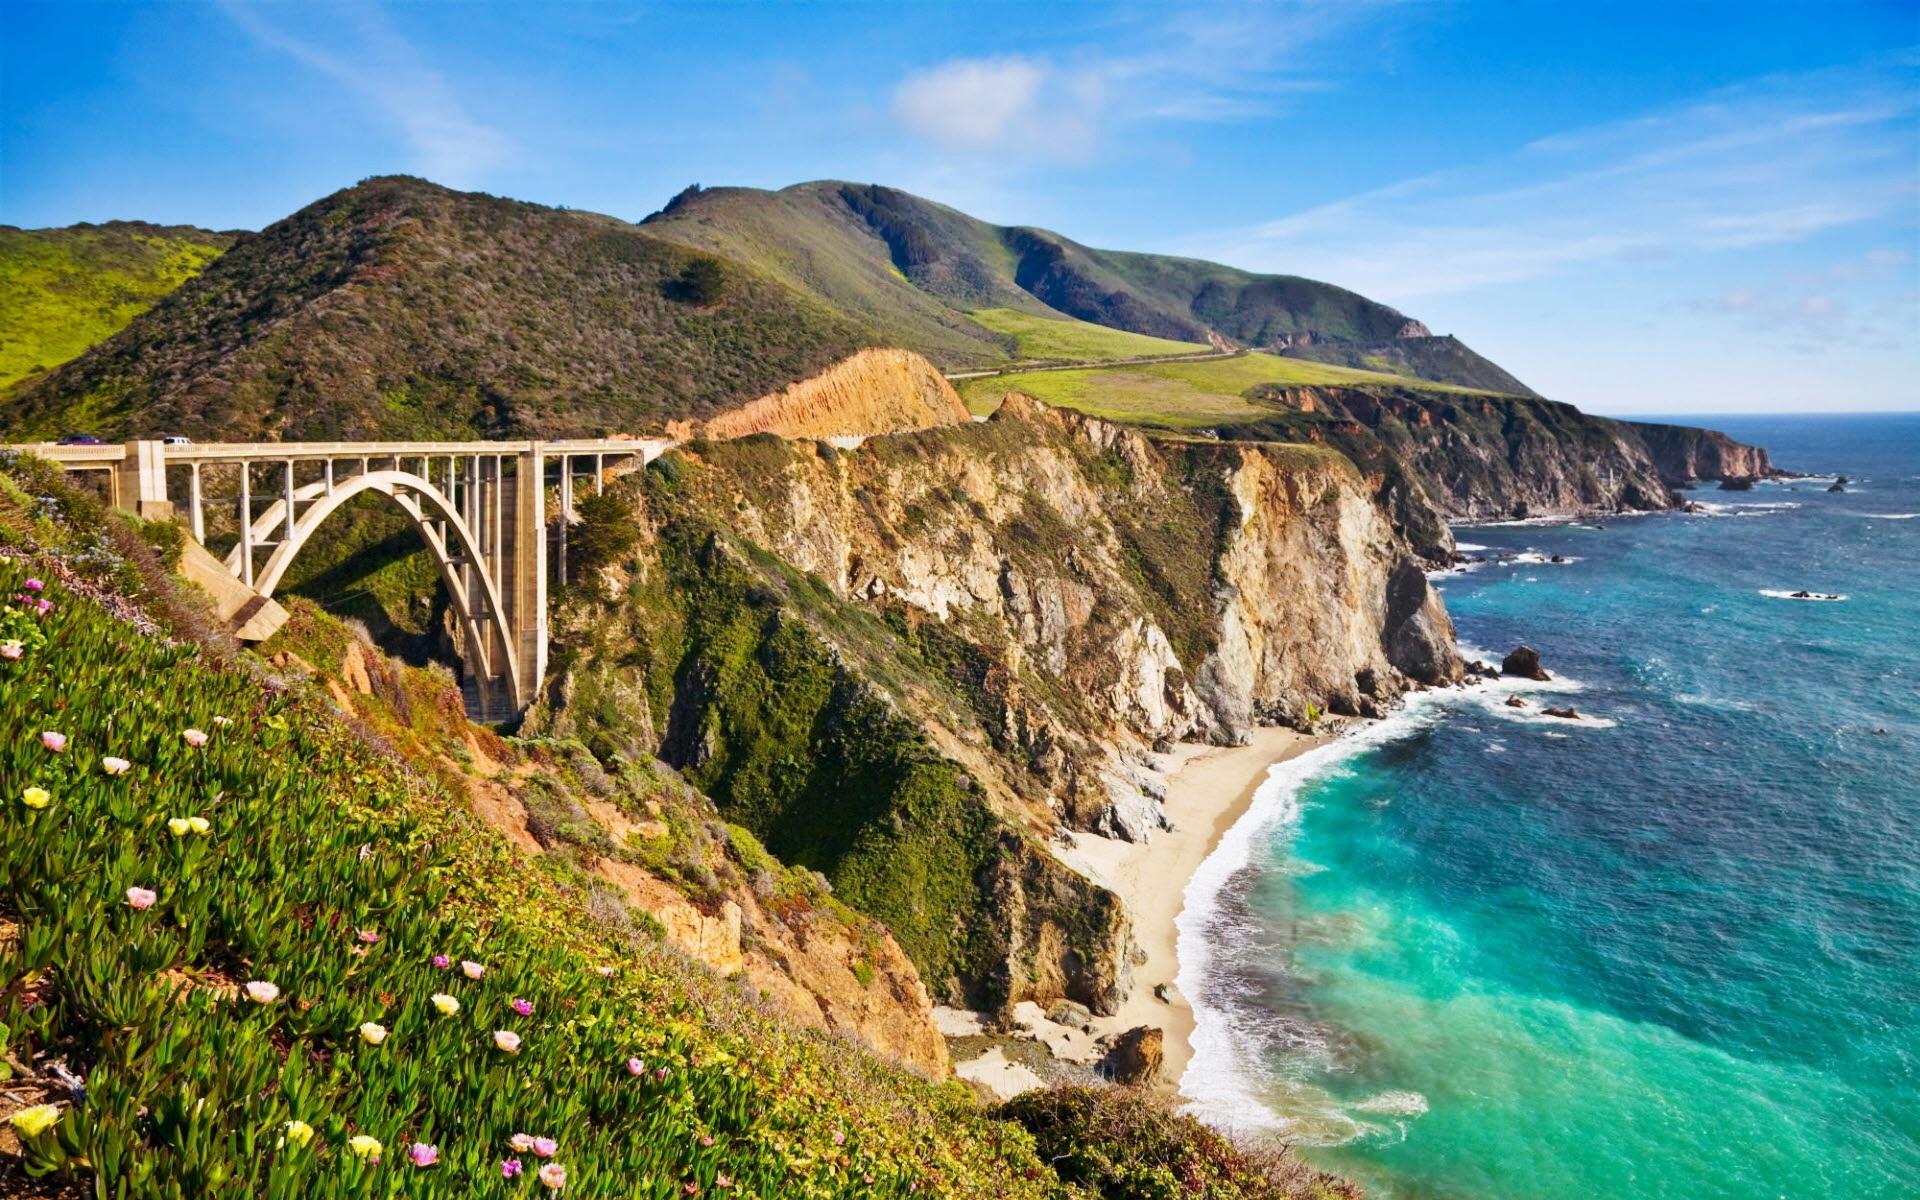 http://3.bp.blogspot.com/-vSpthtYkB-A/UHvJfjaDWTI/AAAAAAAAFXU/lgC9oZytspk/s1920/bixby_bridge_in_big_sur_california-1200.jpg